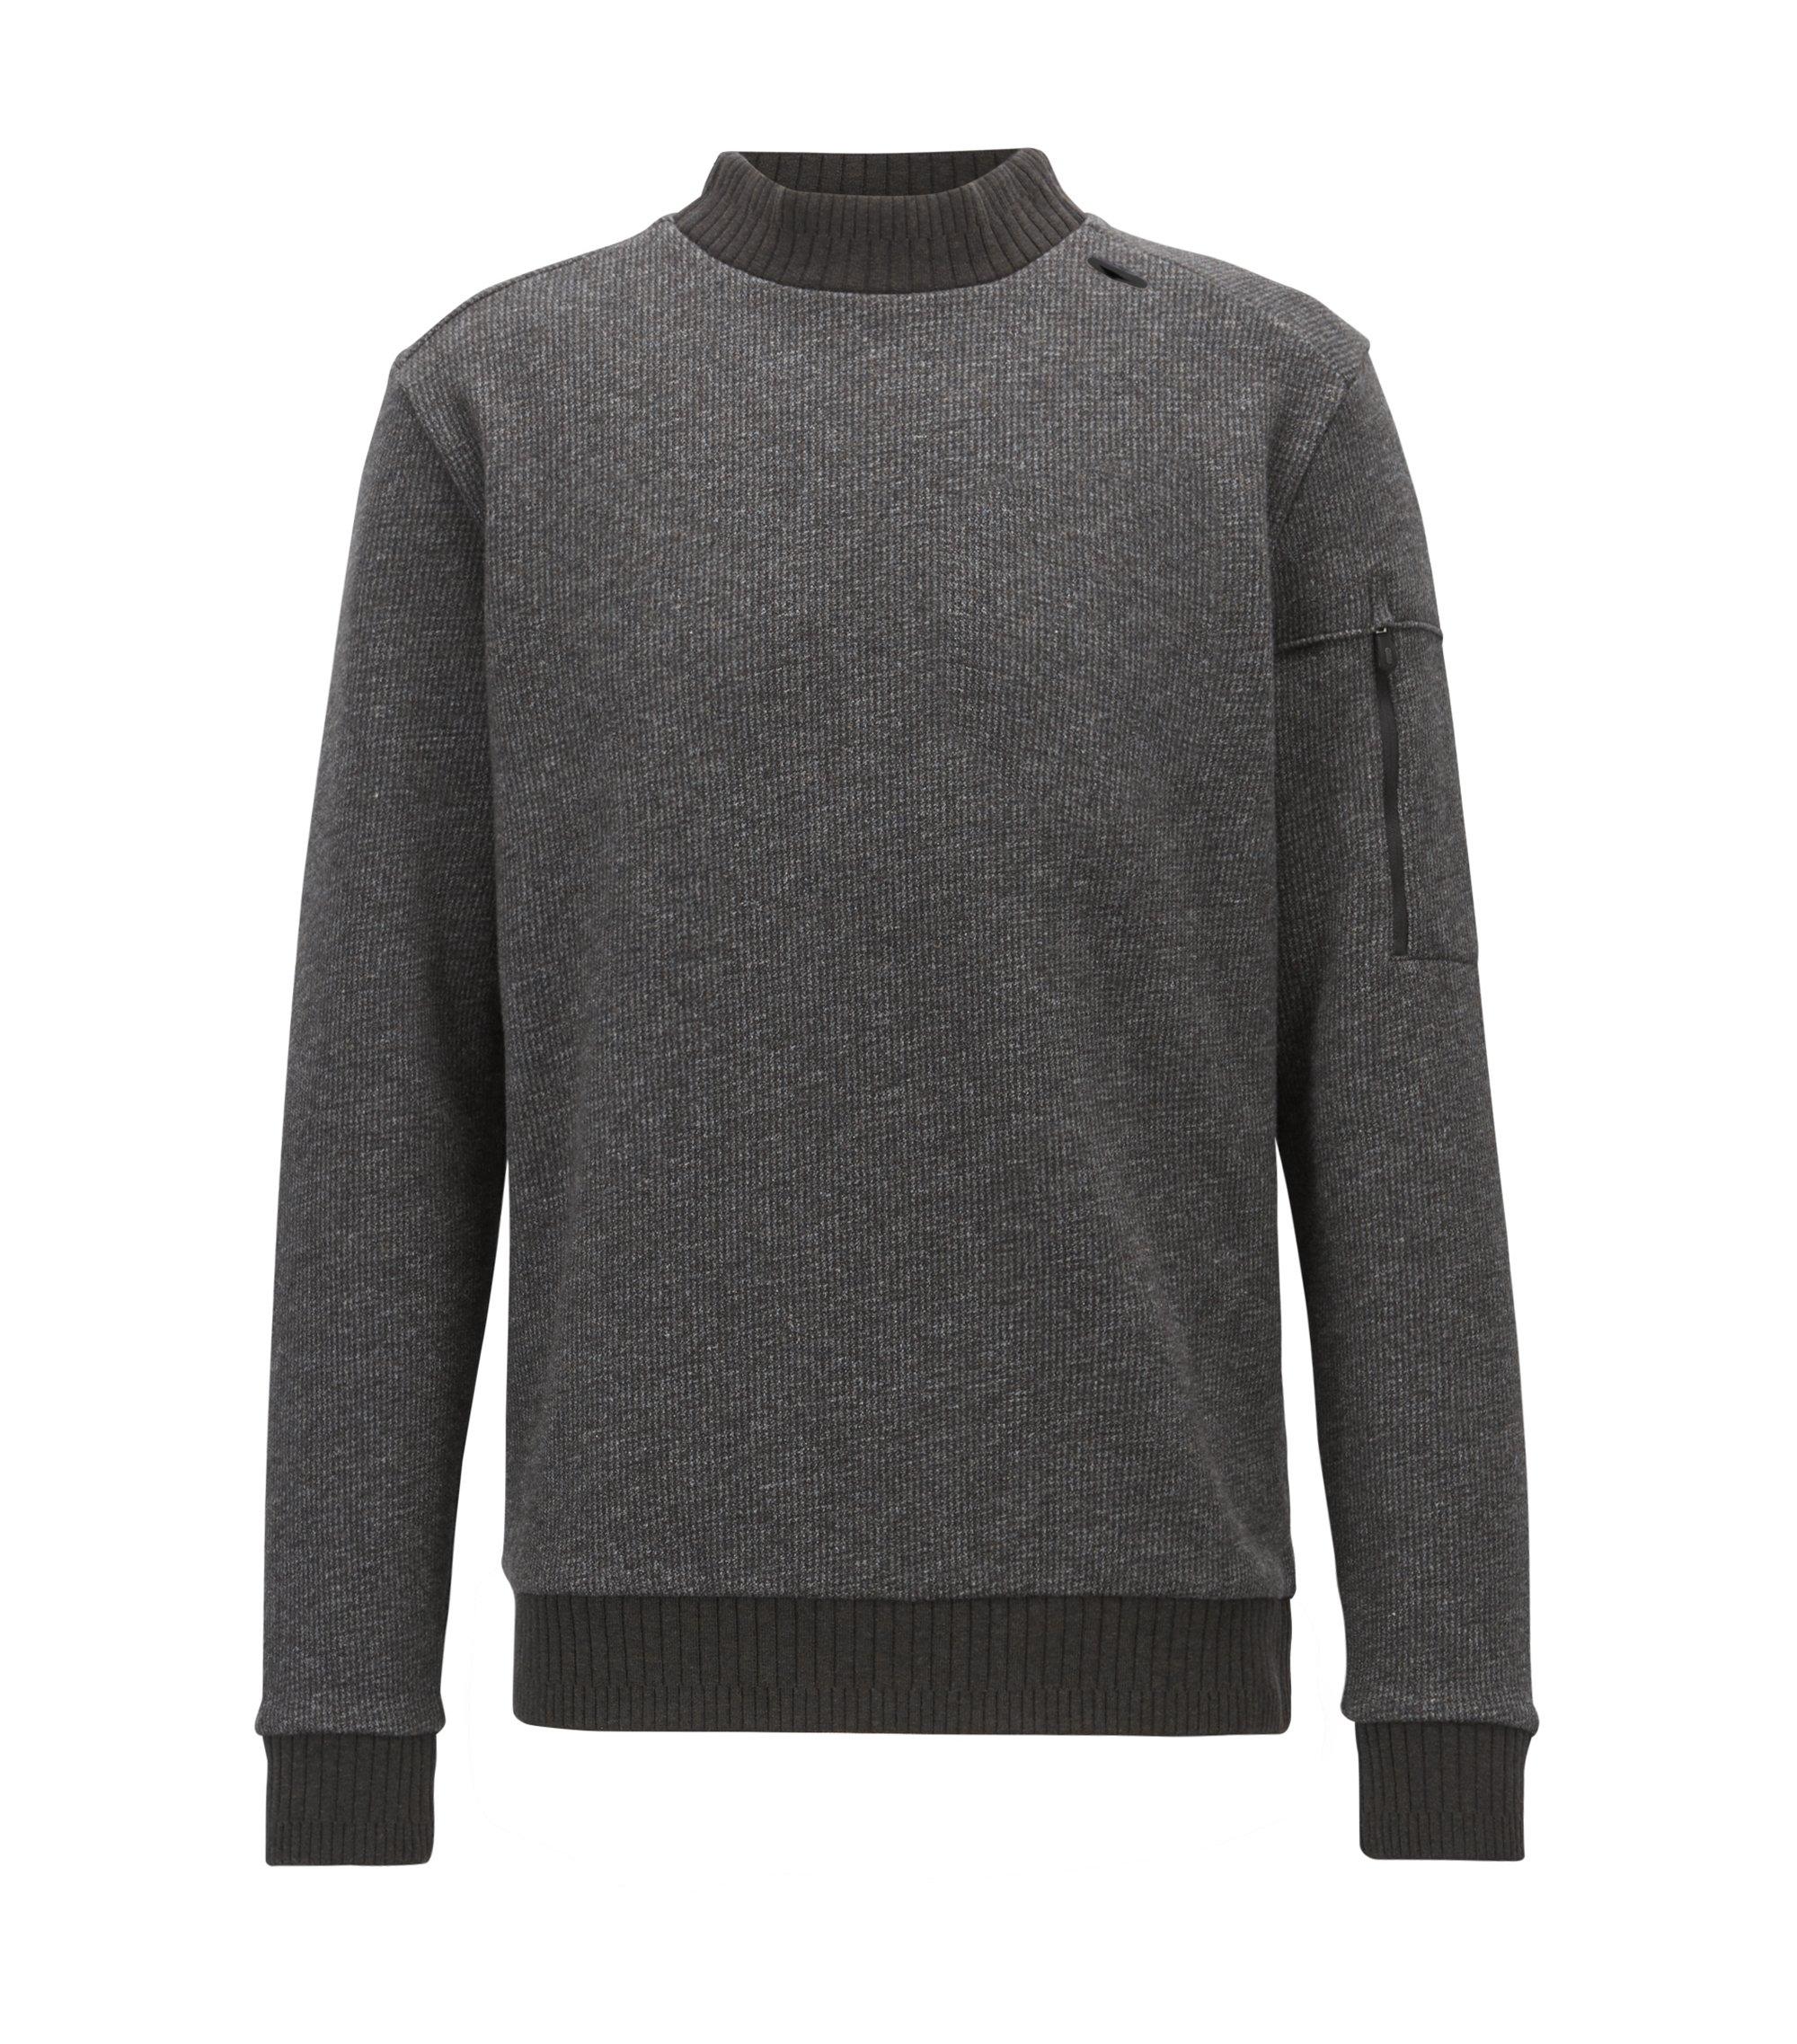 Turtleneck sweater in double-faced cotton-blend fleece, Black